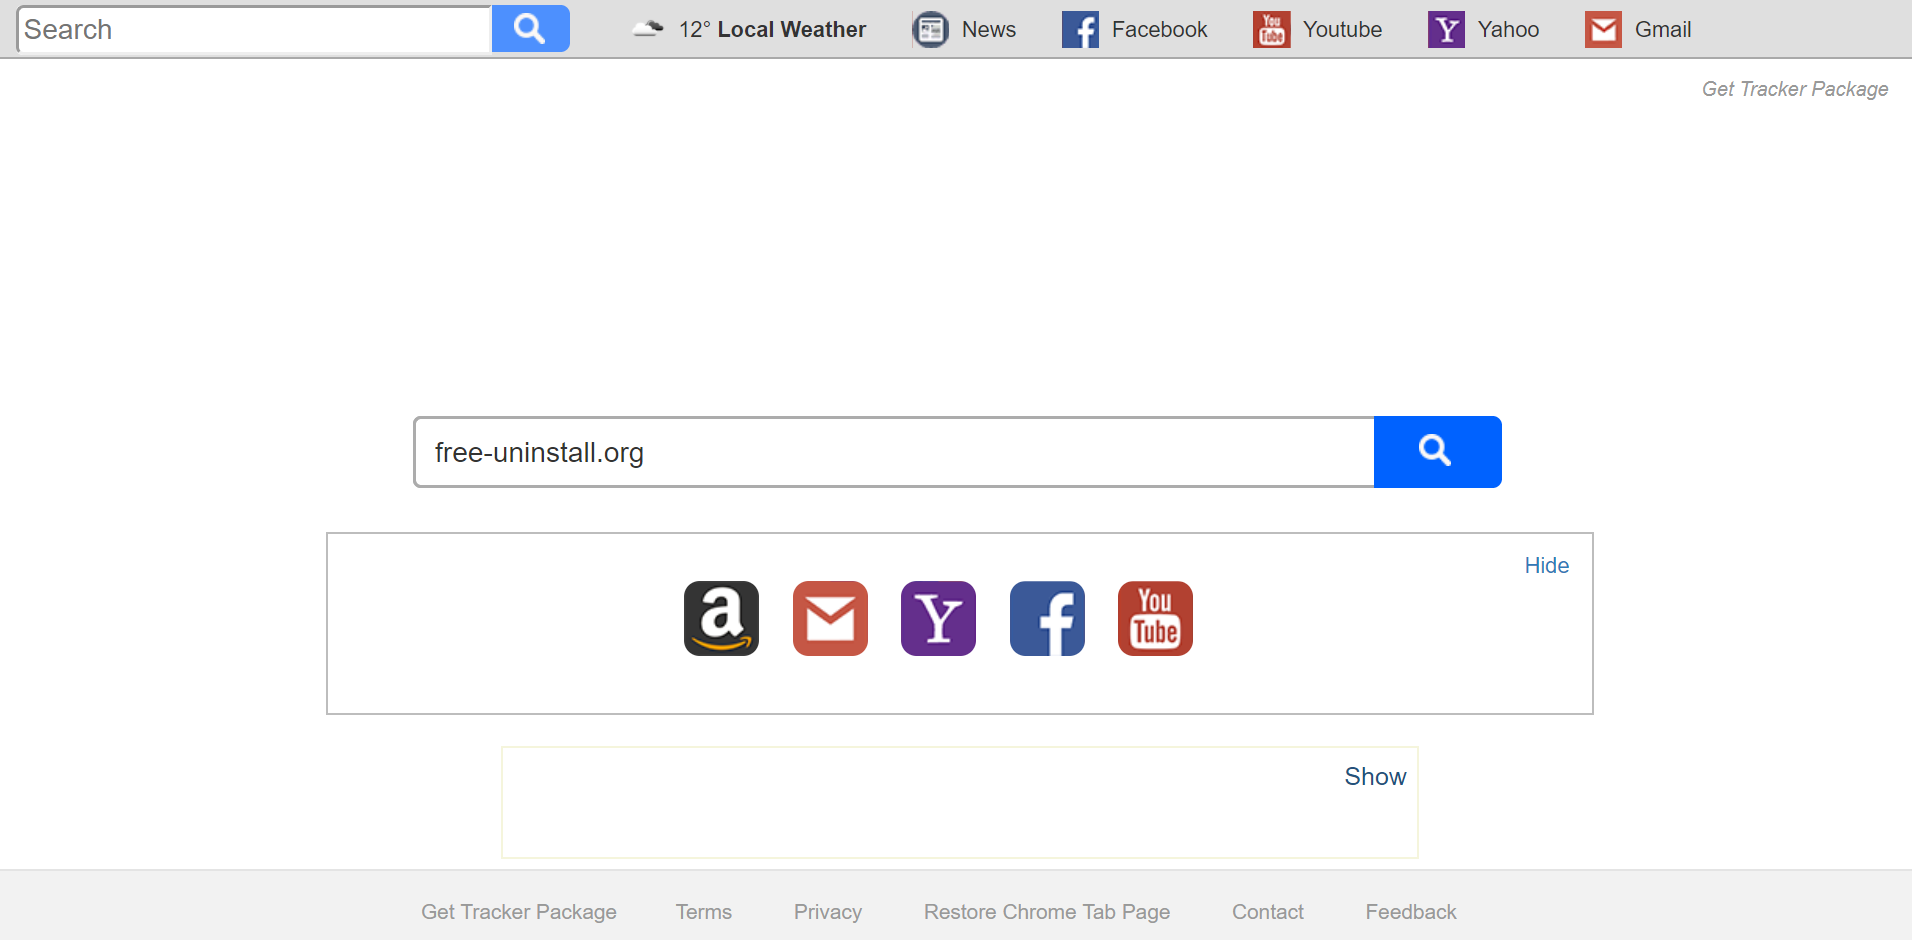 Search.searchgtp.com Hijacker